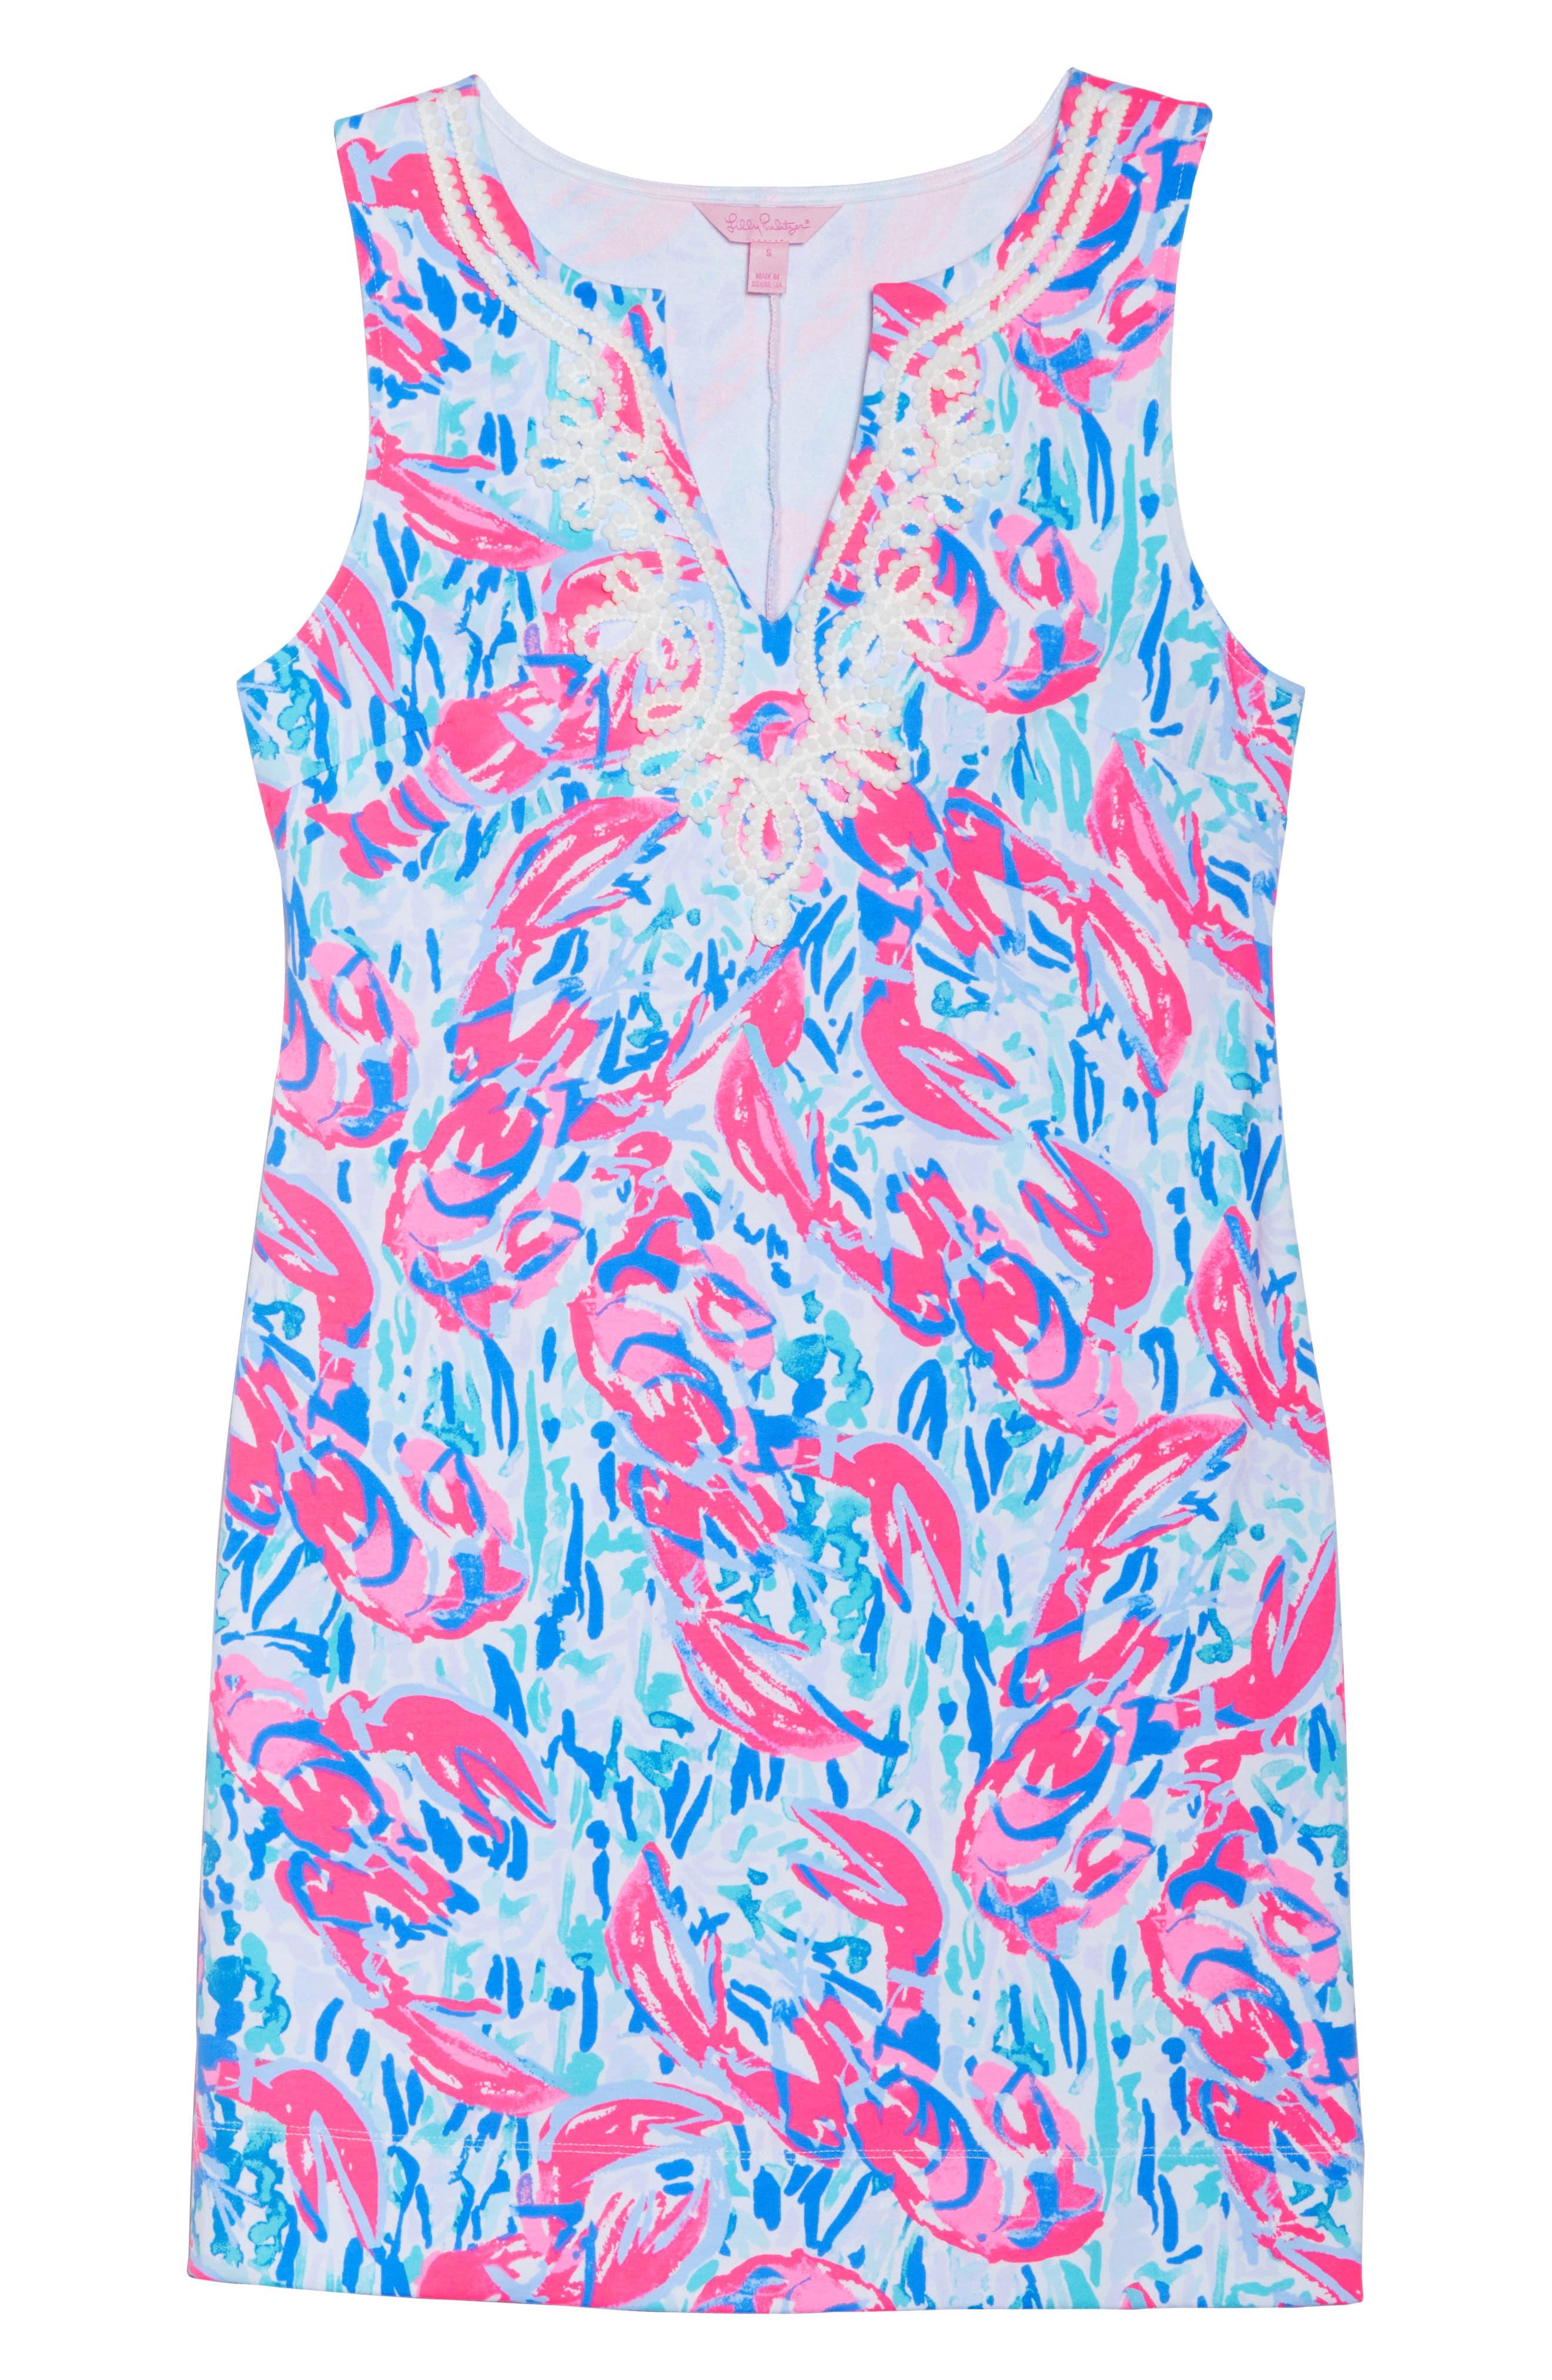 Harper Shift Dress,                             Alternate thumbnail 6, color,                             Cosmic Coral Cracked Up